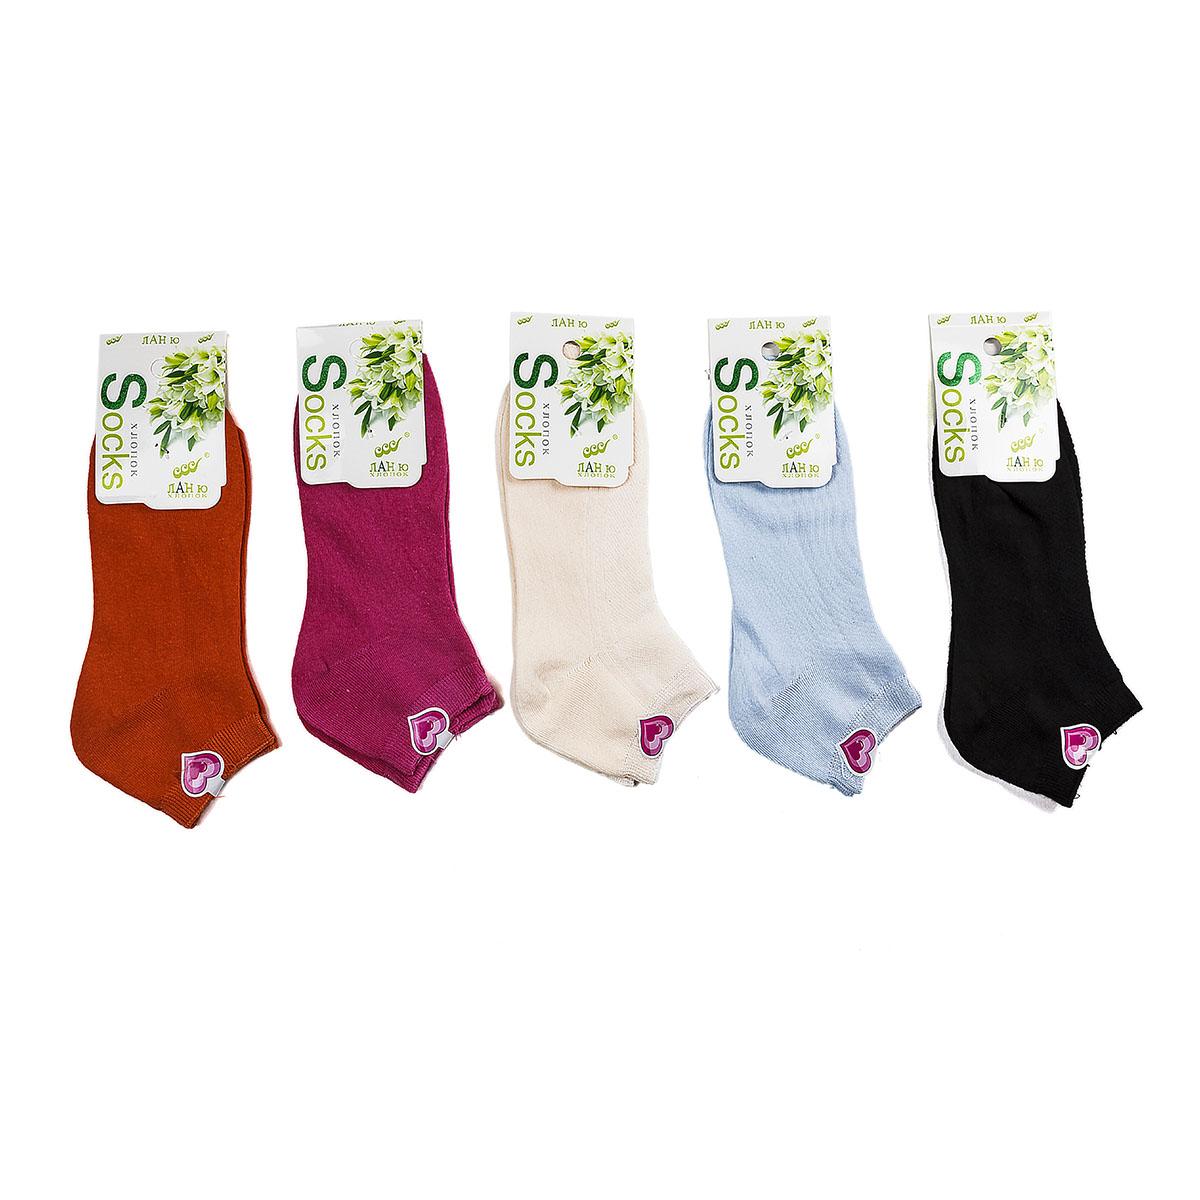 Носки женские «Ланю», цвет МалиновыйНоски и чулки<br><br><br>Тип: Жен. носки<br>Размер: 38-42<br>Материал: Трикотаж